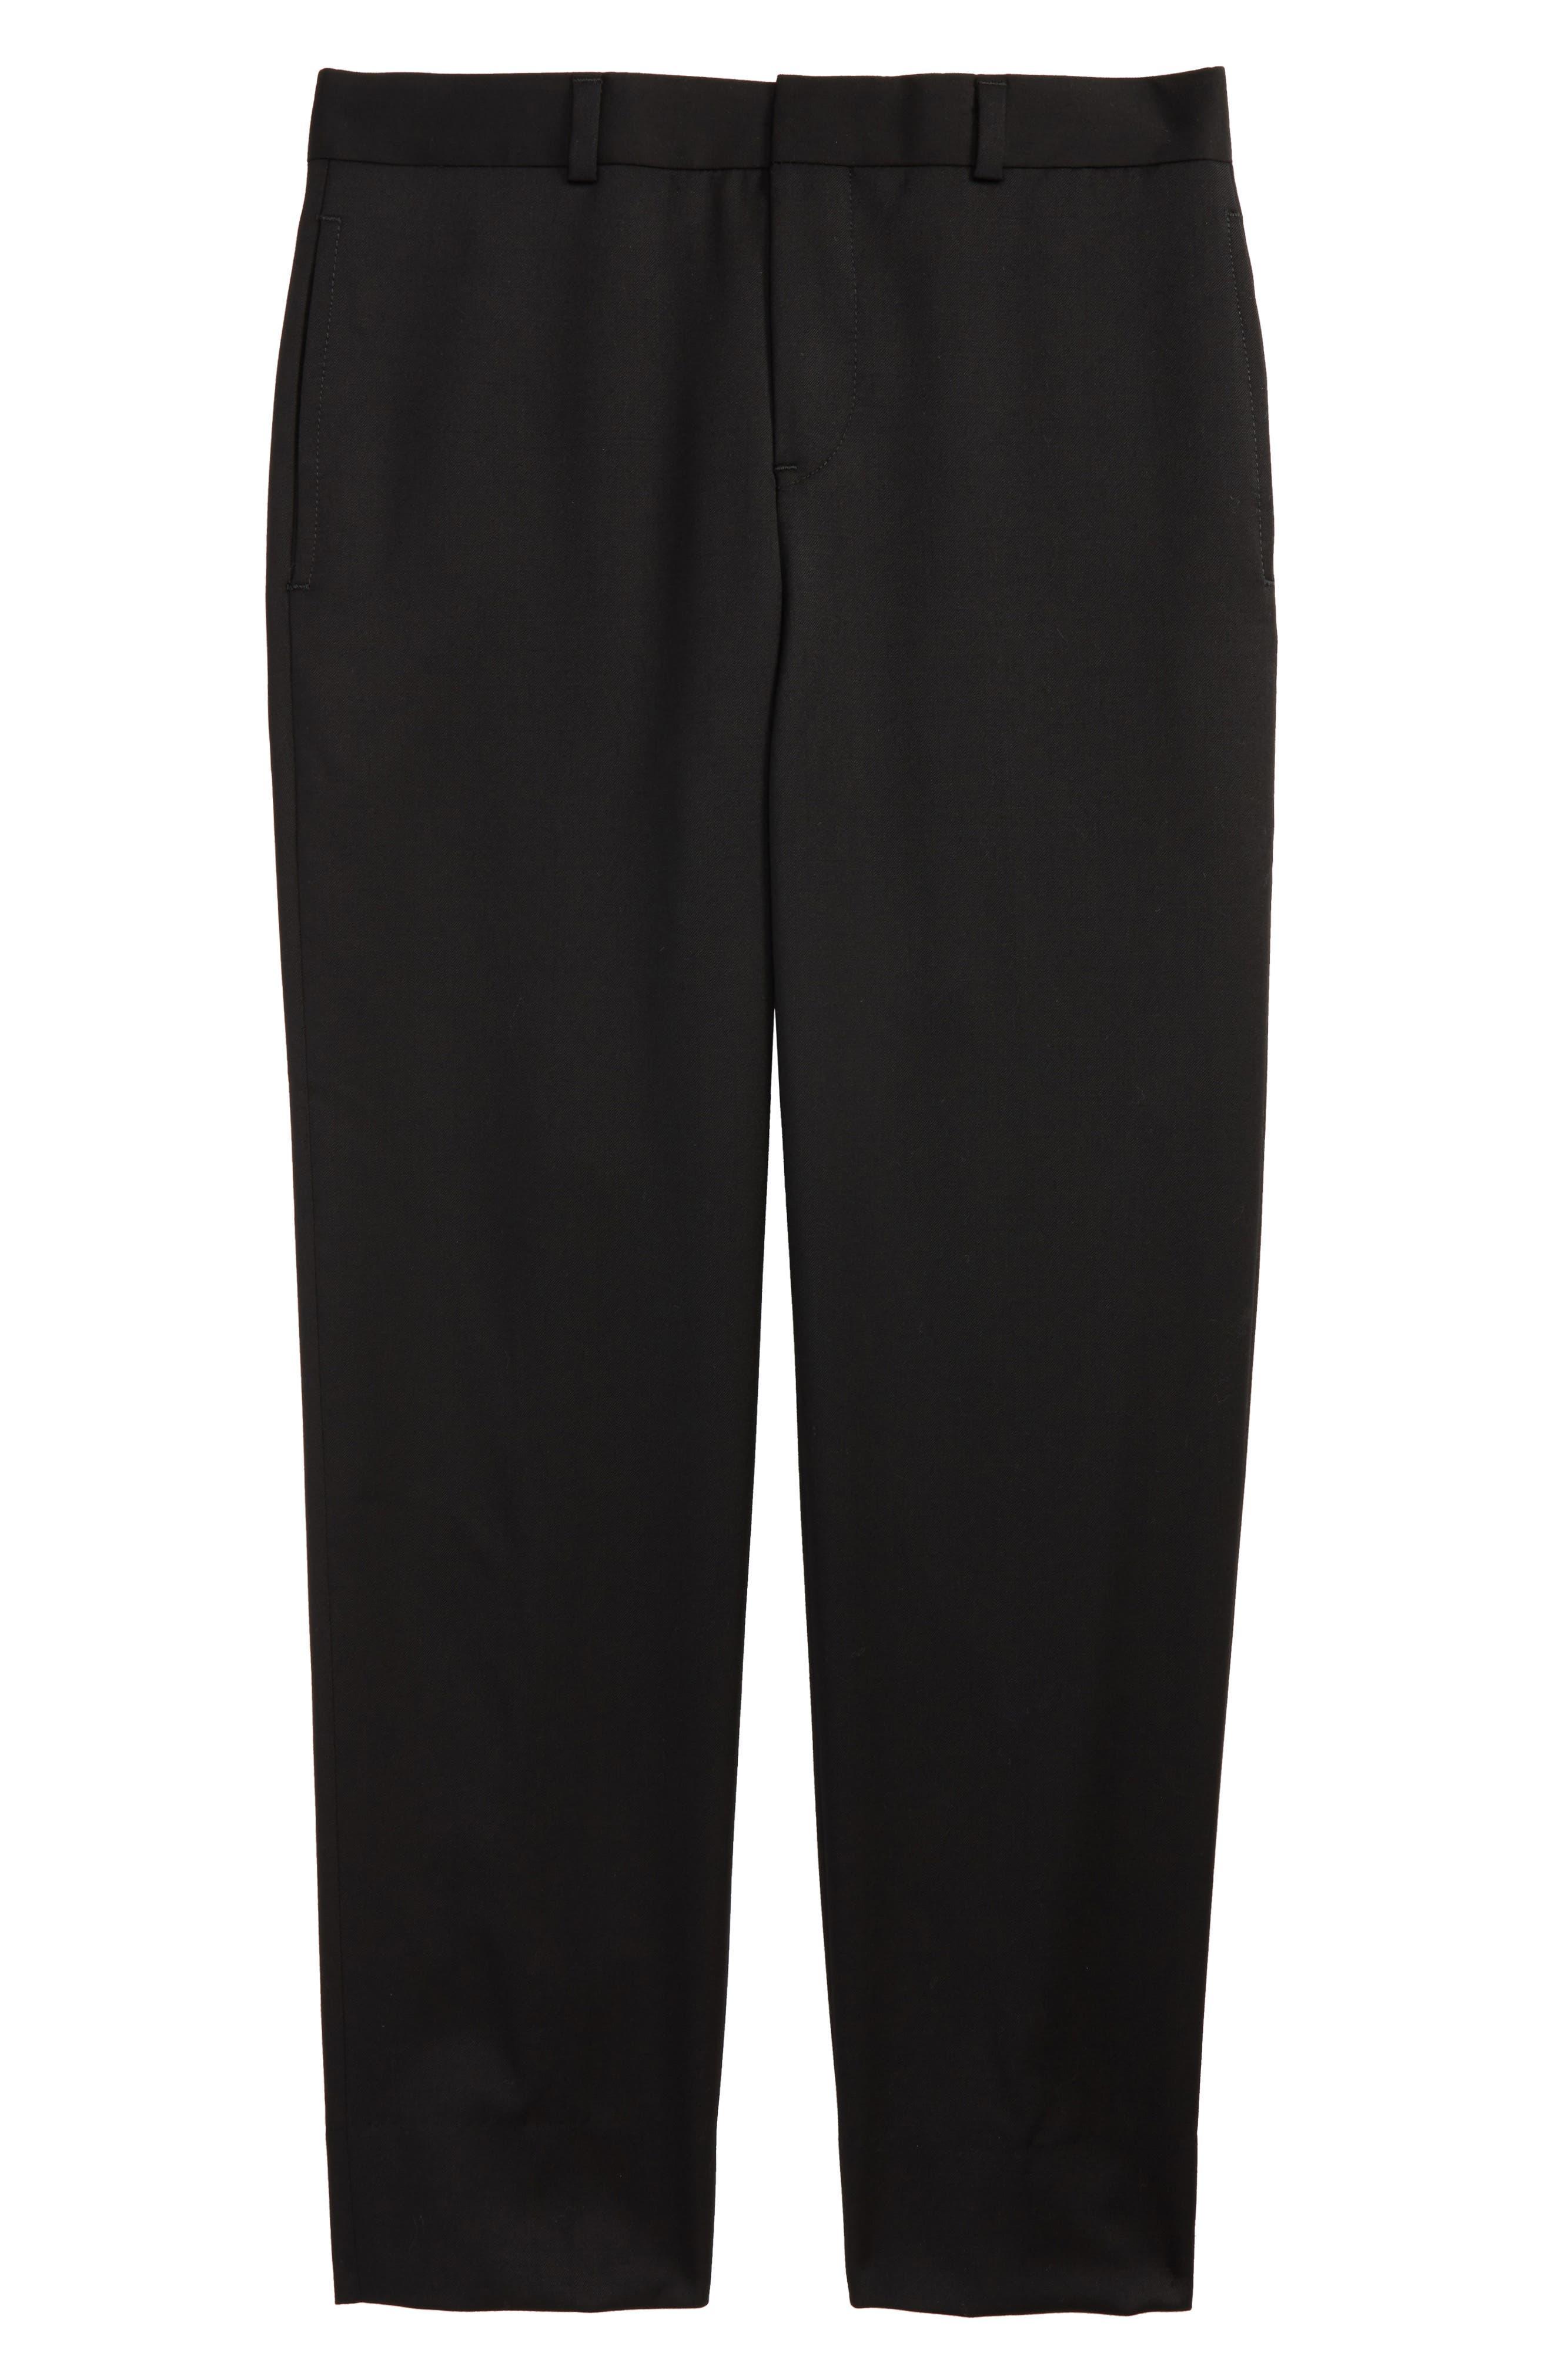 Flat Front Trousers,                             Main thumbnail 1, color,                             Black